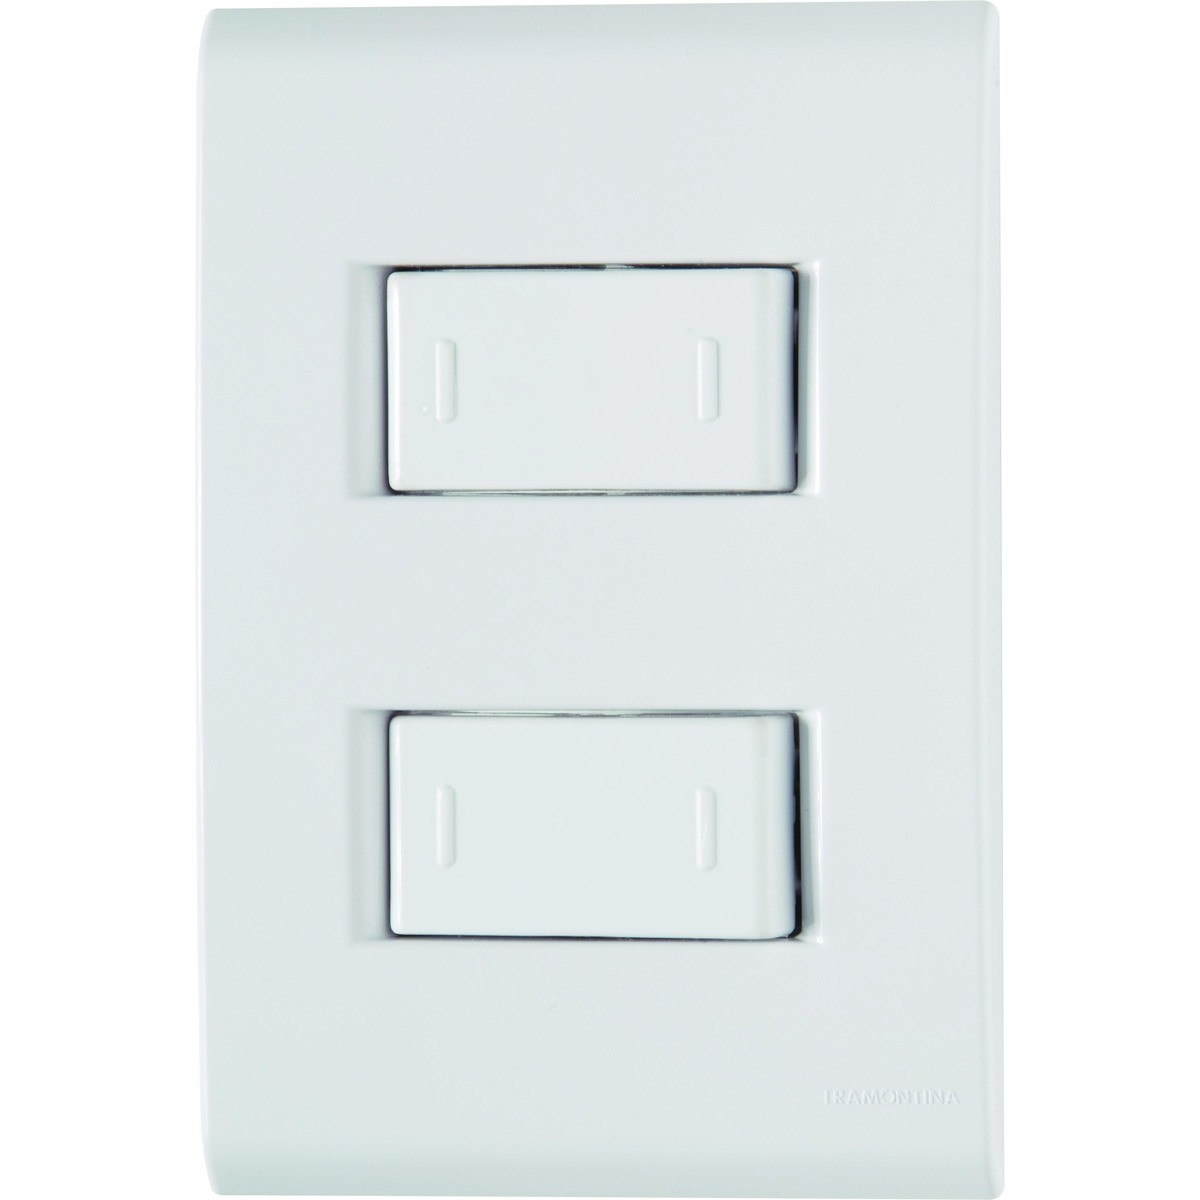 Modulo Interruptor Paralelo 1 Modulo 10A - Liz - Tramontina